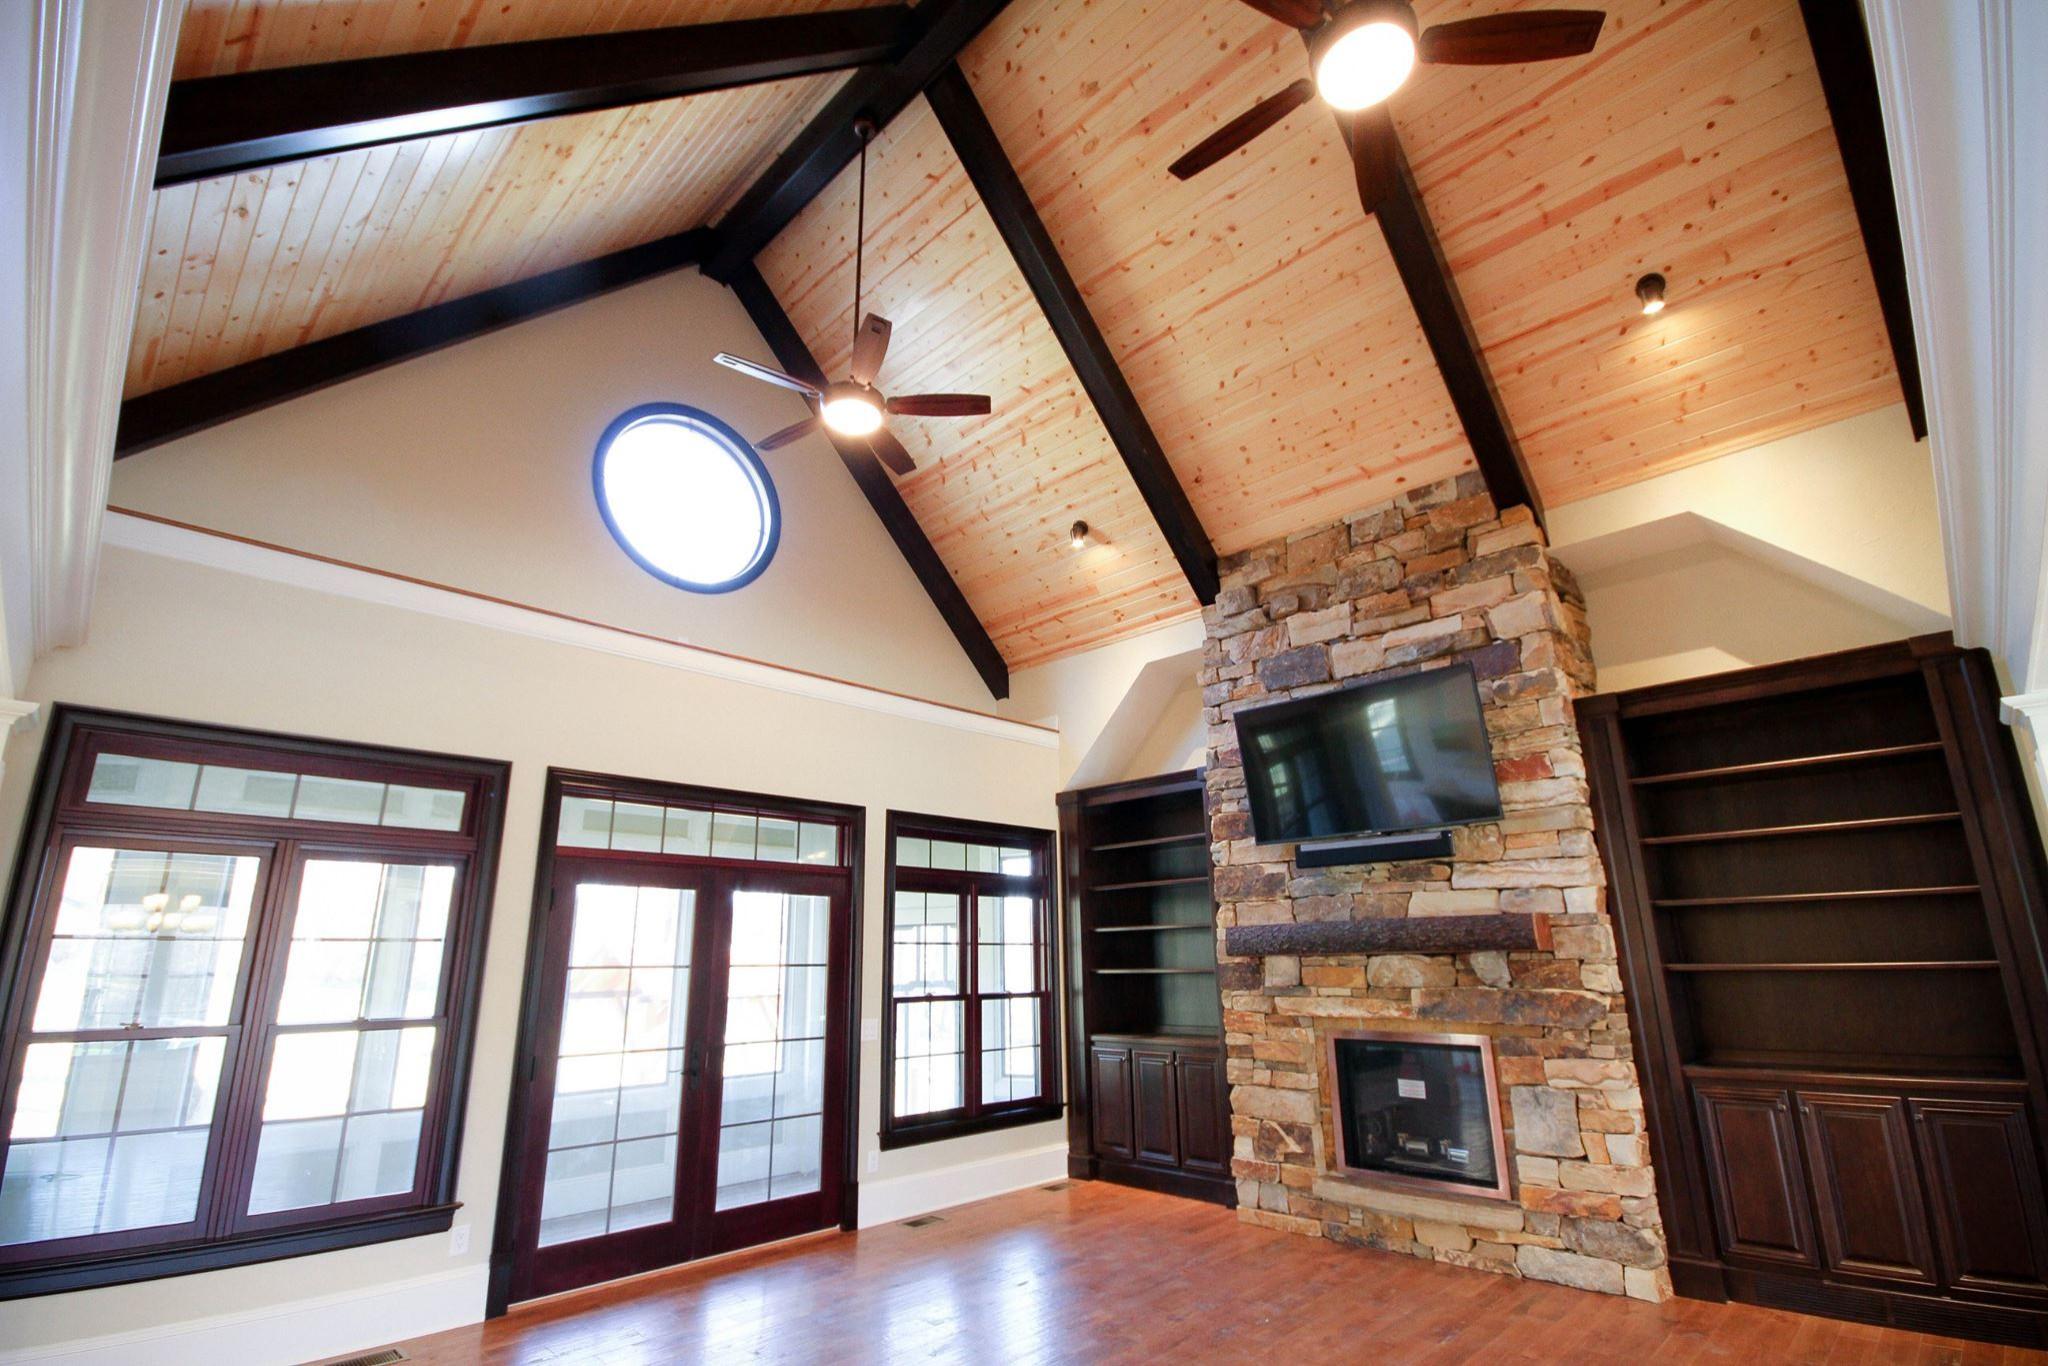 Craftsman Style Home in Morgantown, West Virginia